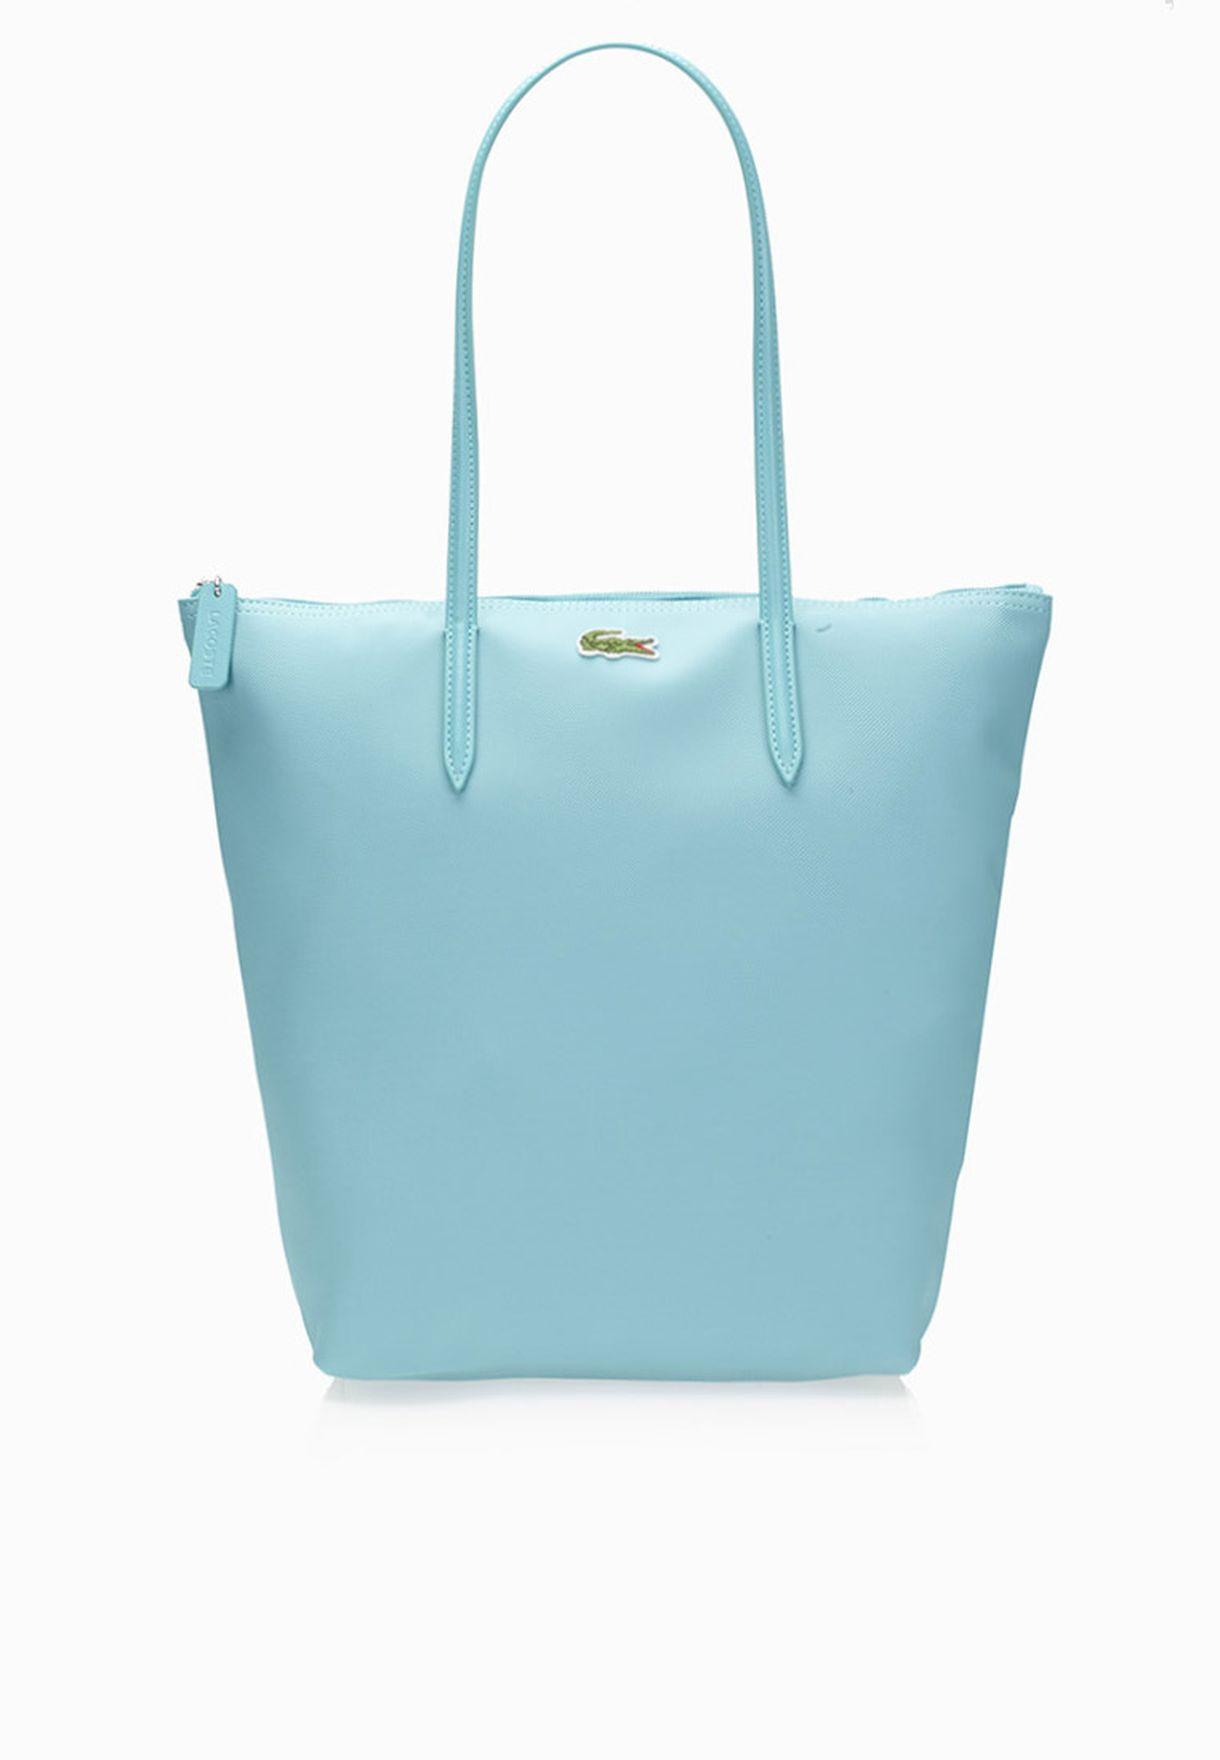 e53a0c4cba9 Shop Lacoste blue Vertical Tote Bag NF0647PO-098 for Women in UAE ...